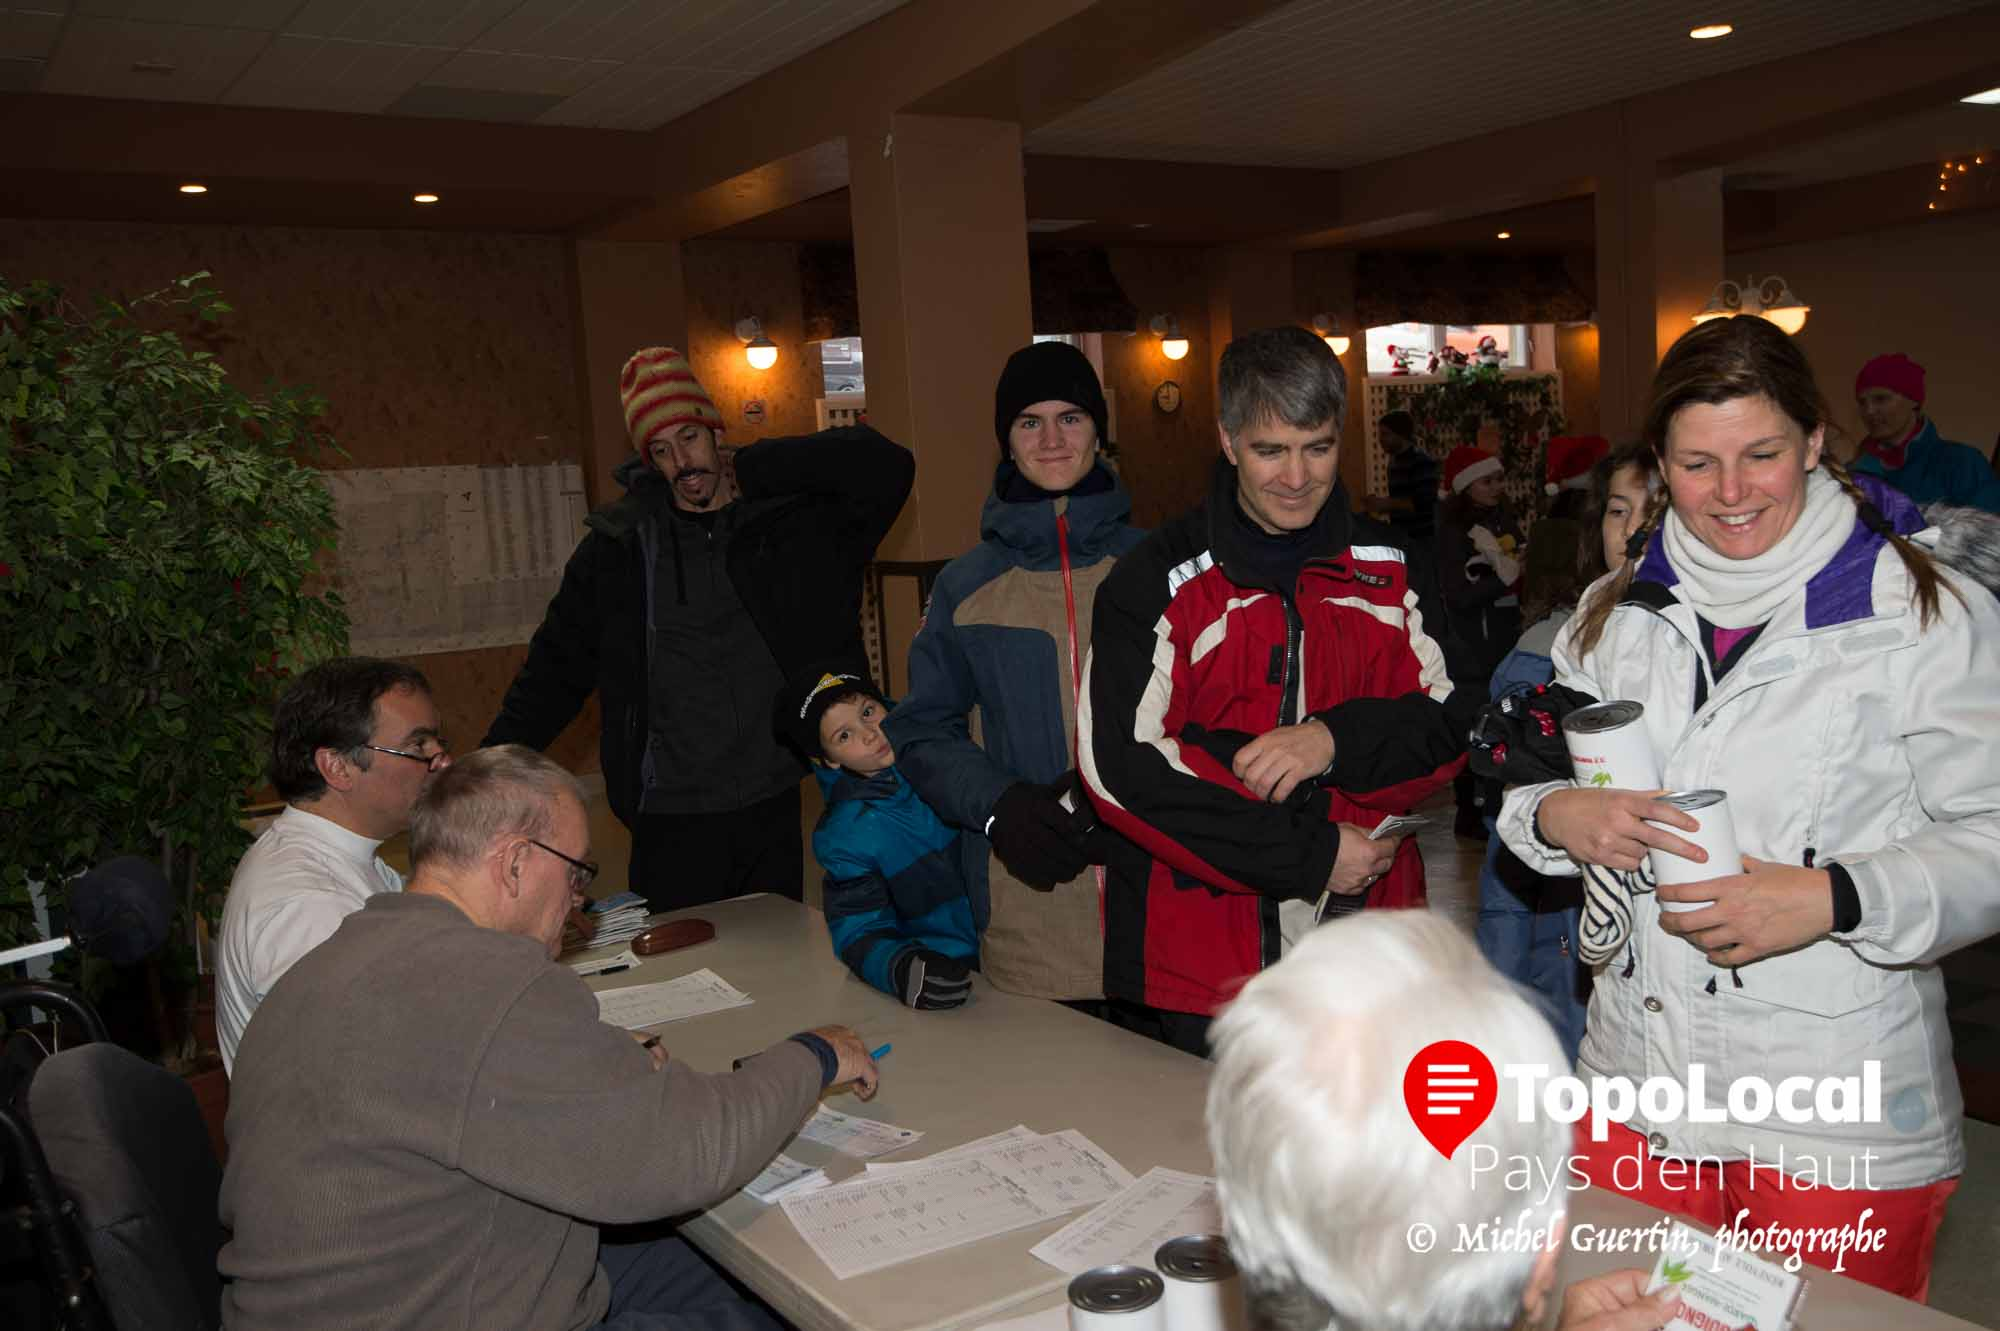 20161210-sainte-adele-guignolee-garde-manger-apys-haut-chevaliers-colomb-19